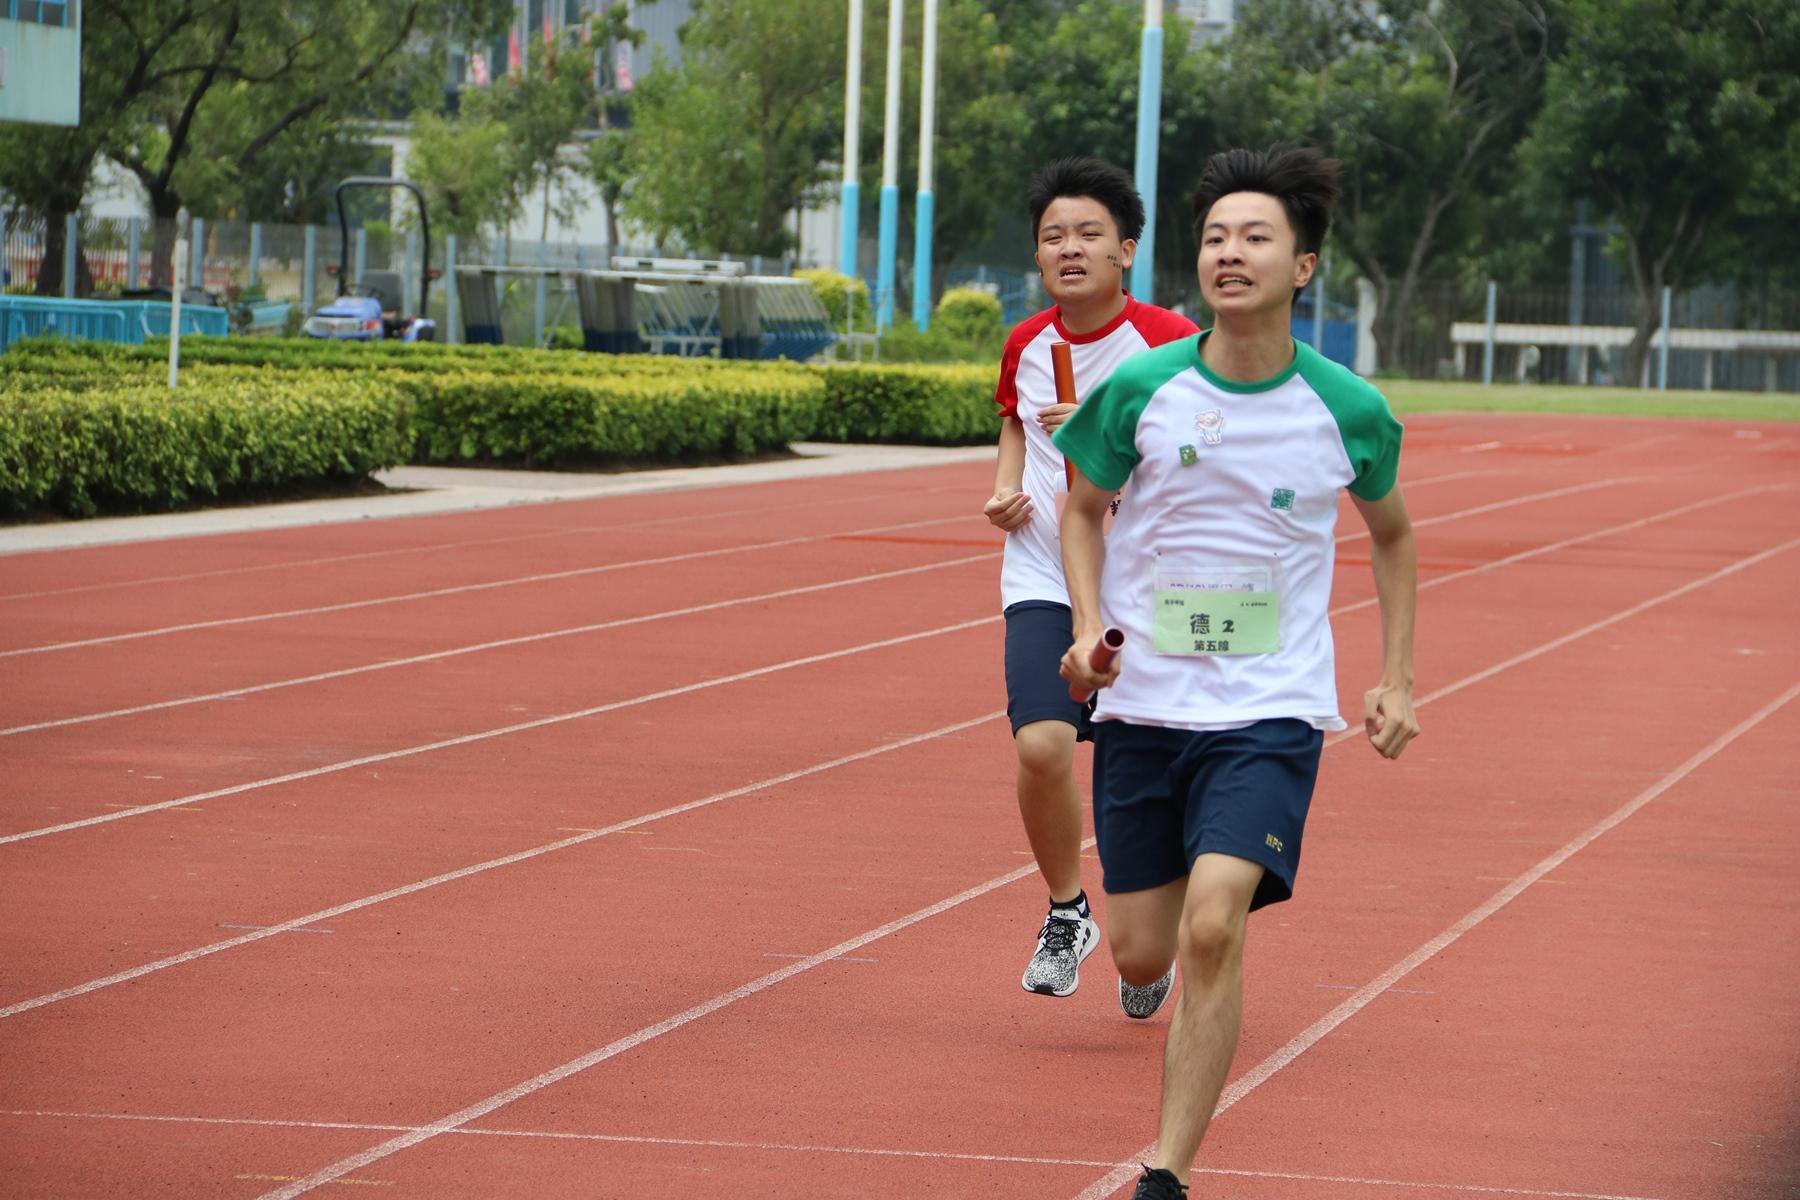 https://www.npc.edu.hk/sites/default/files/img_5408.jpg